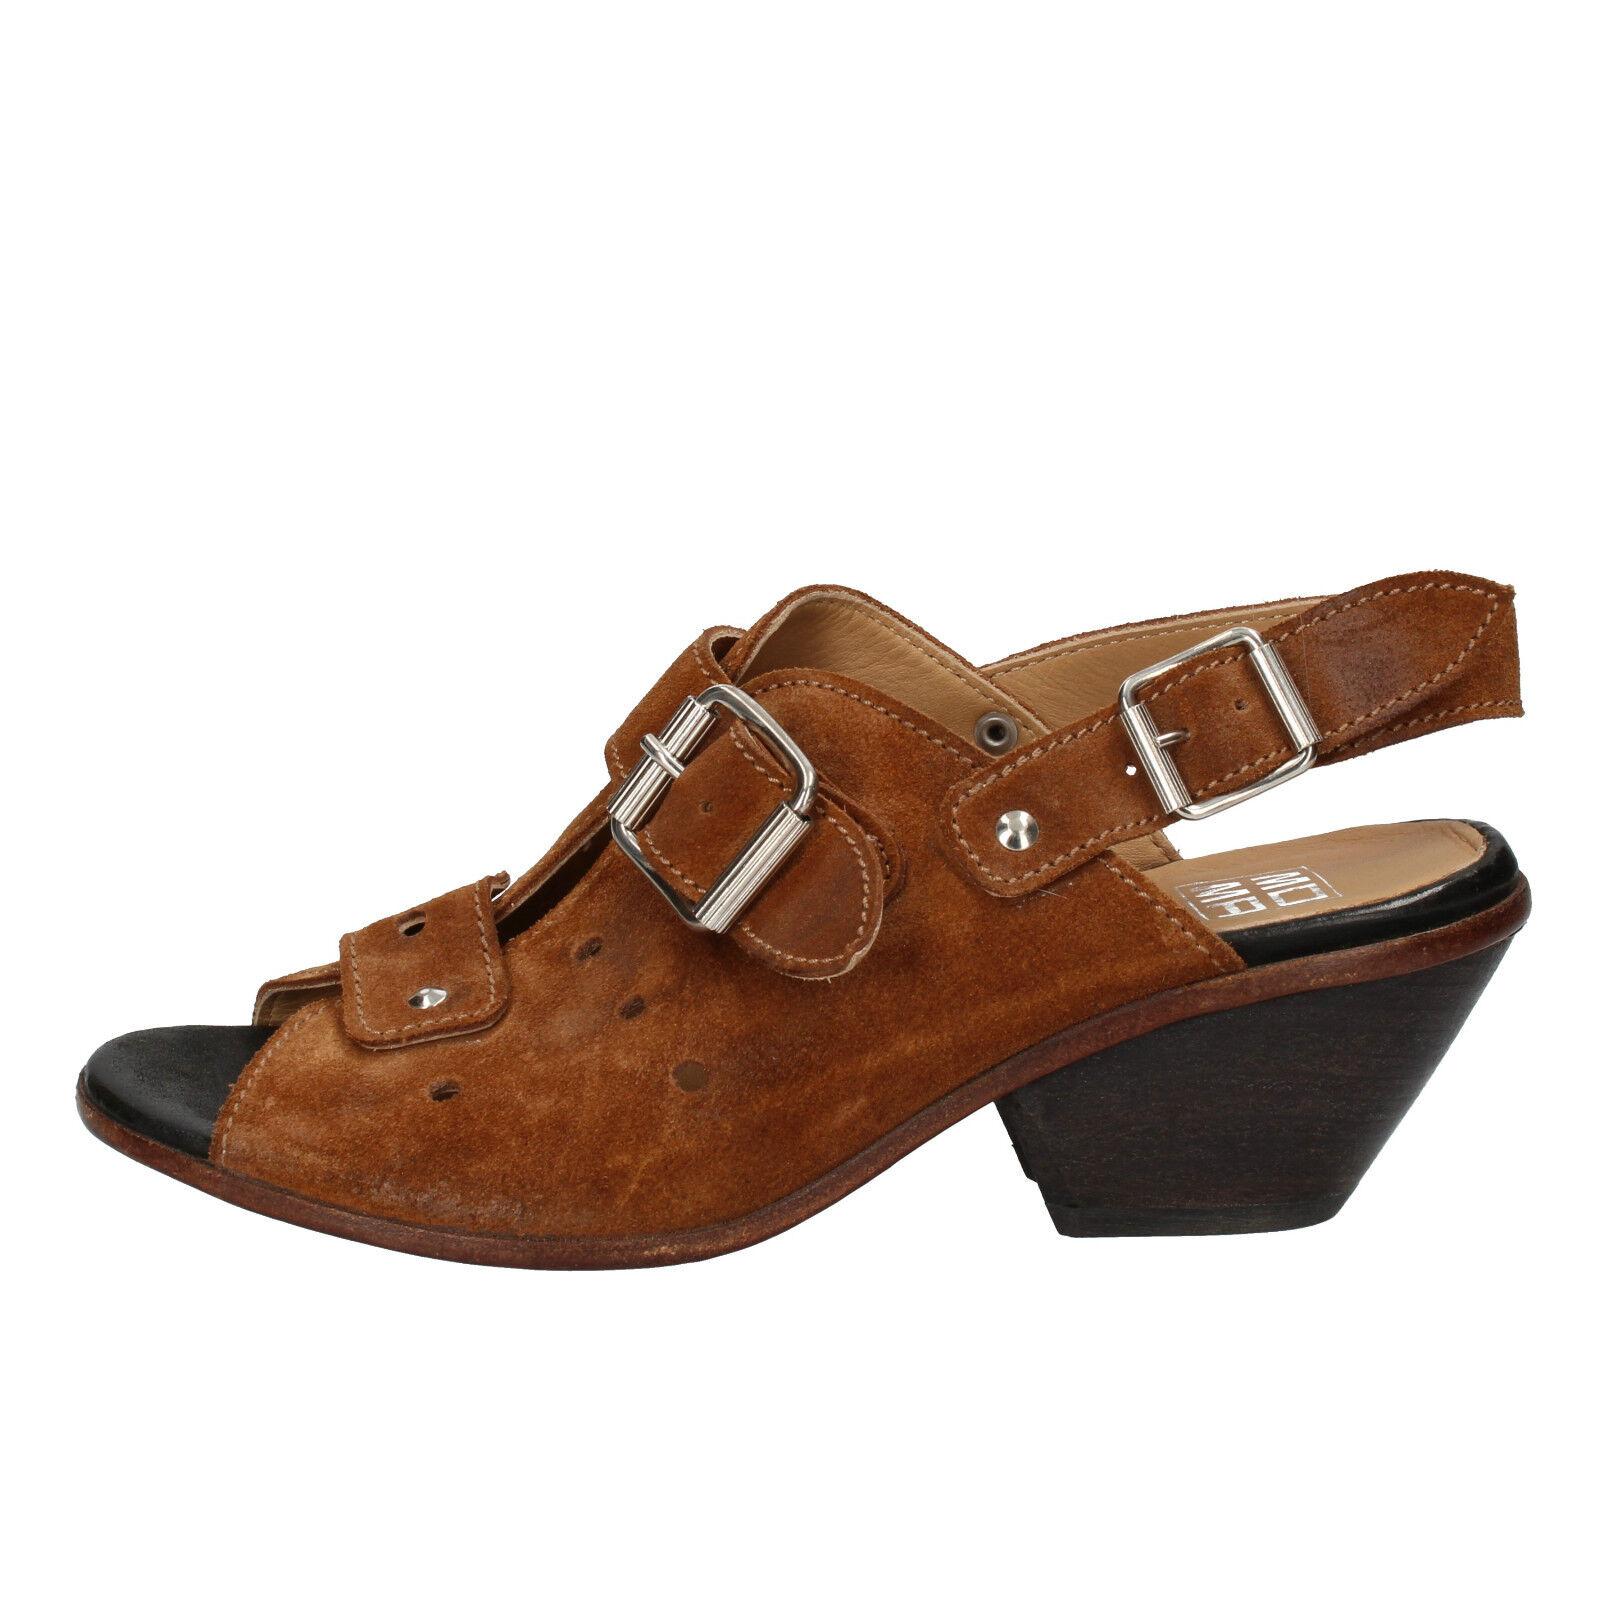 Damen schuhe MOMA 37 EU sandalen braun wildleder AD158-B